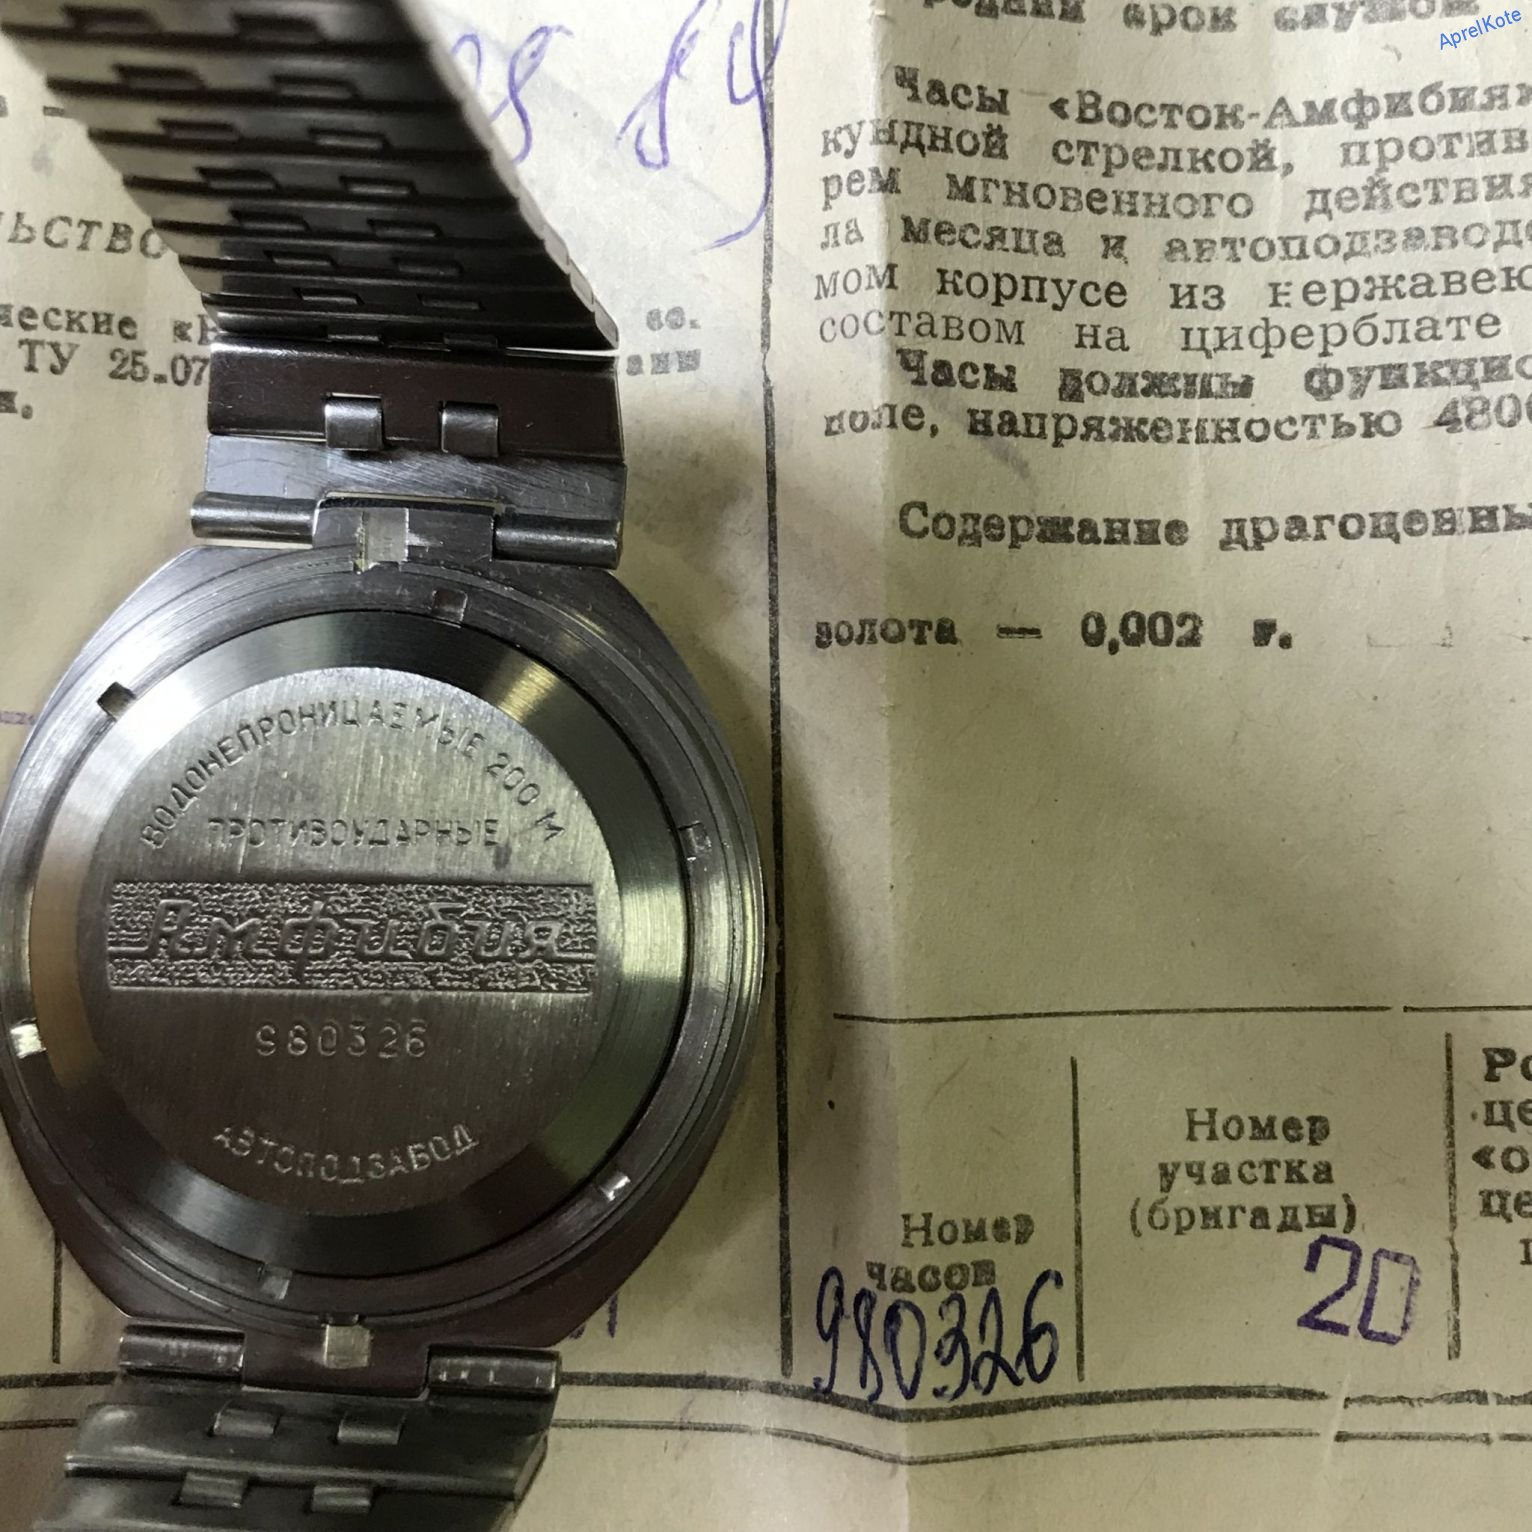 [VENDUE] Vostok Scuba Dude 9370 CCCP 18080110024712775415830668